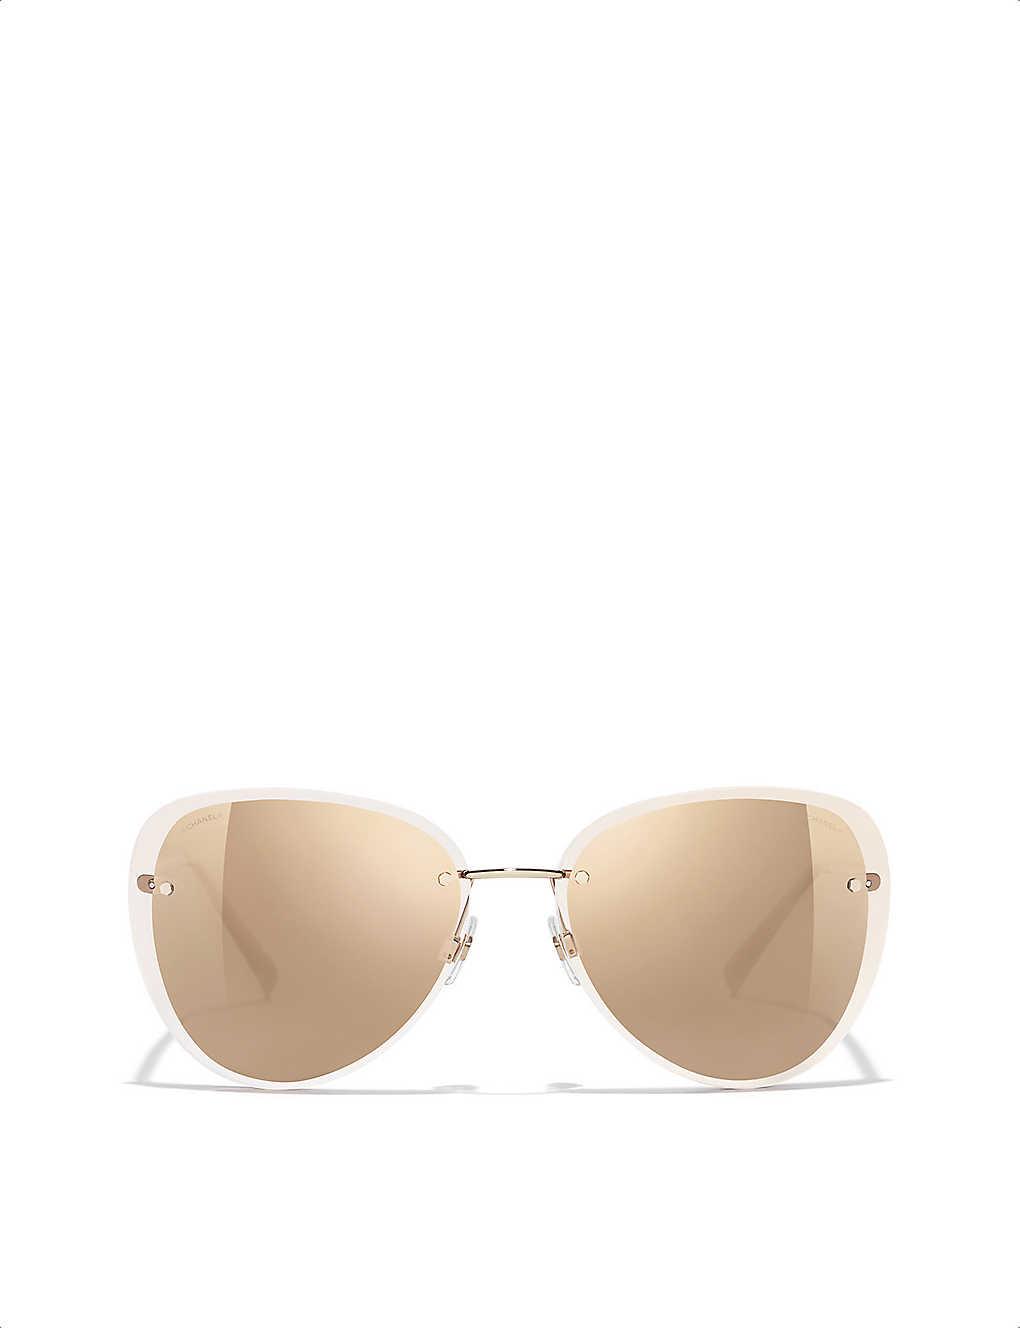 b3cbd5b43dc CHANEL - Pilot sunglasses